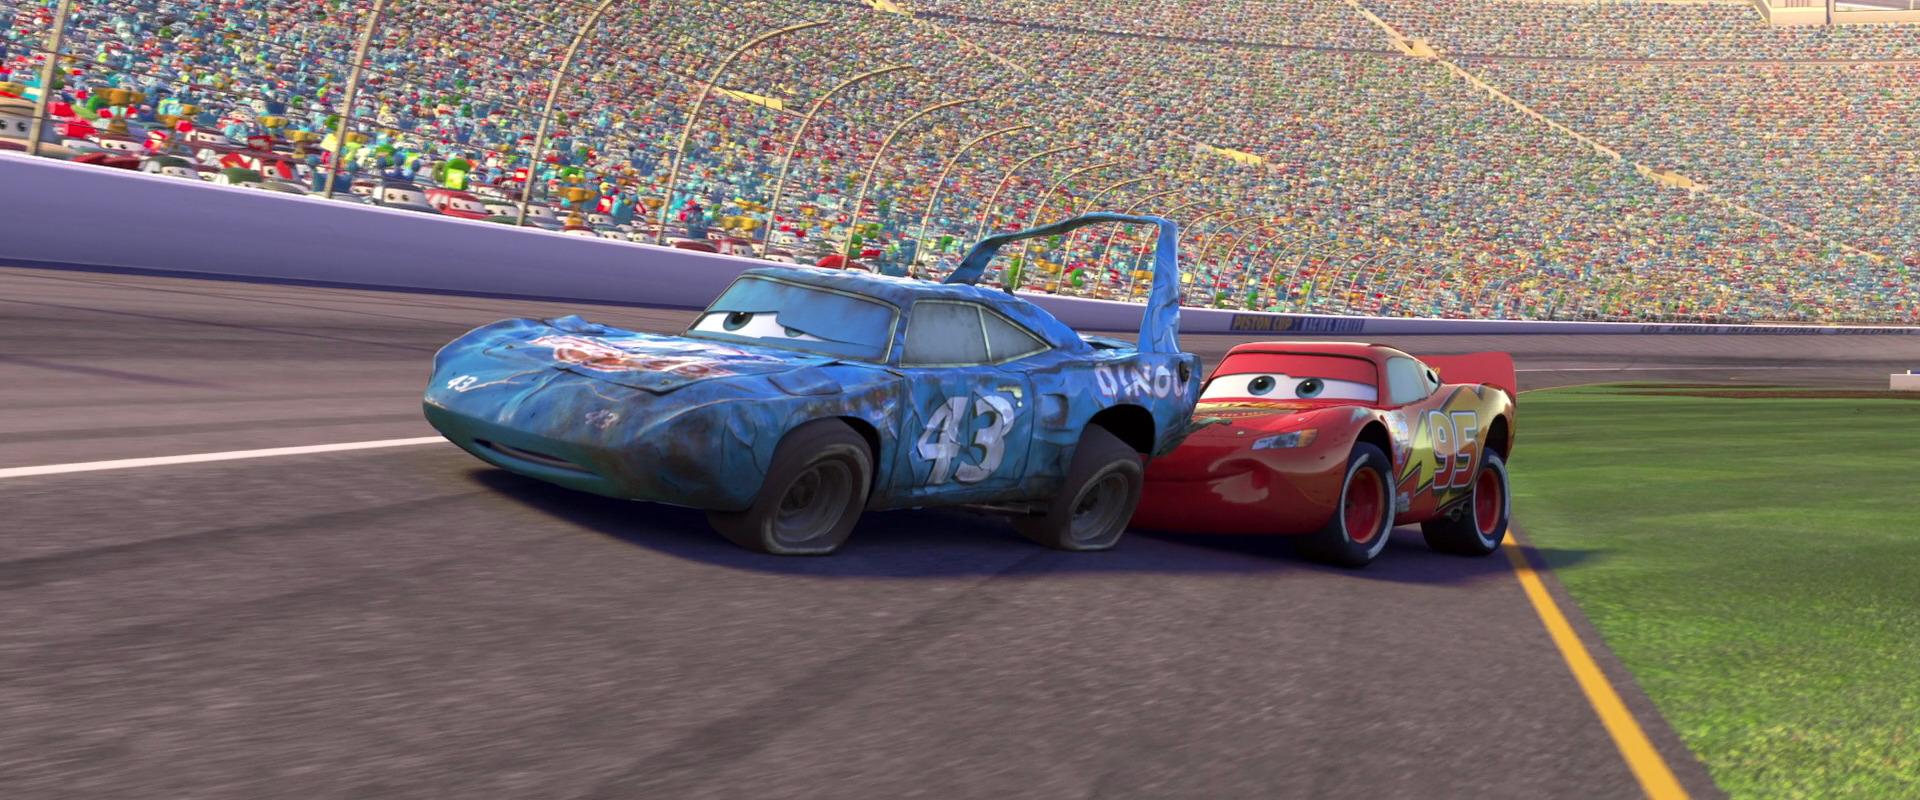 Cars The King Crash Scene